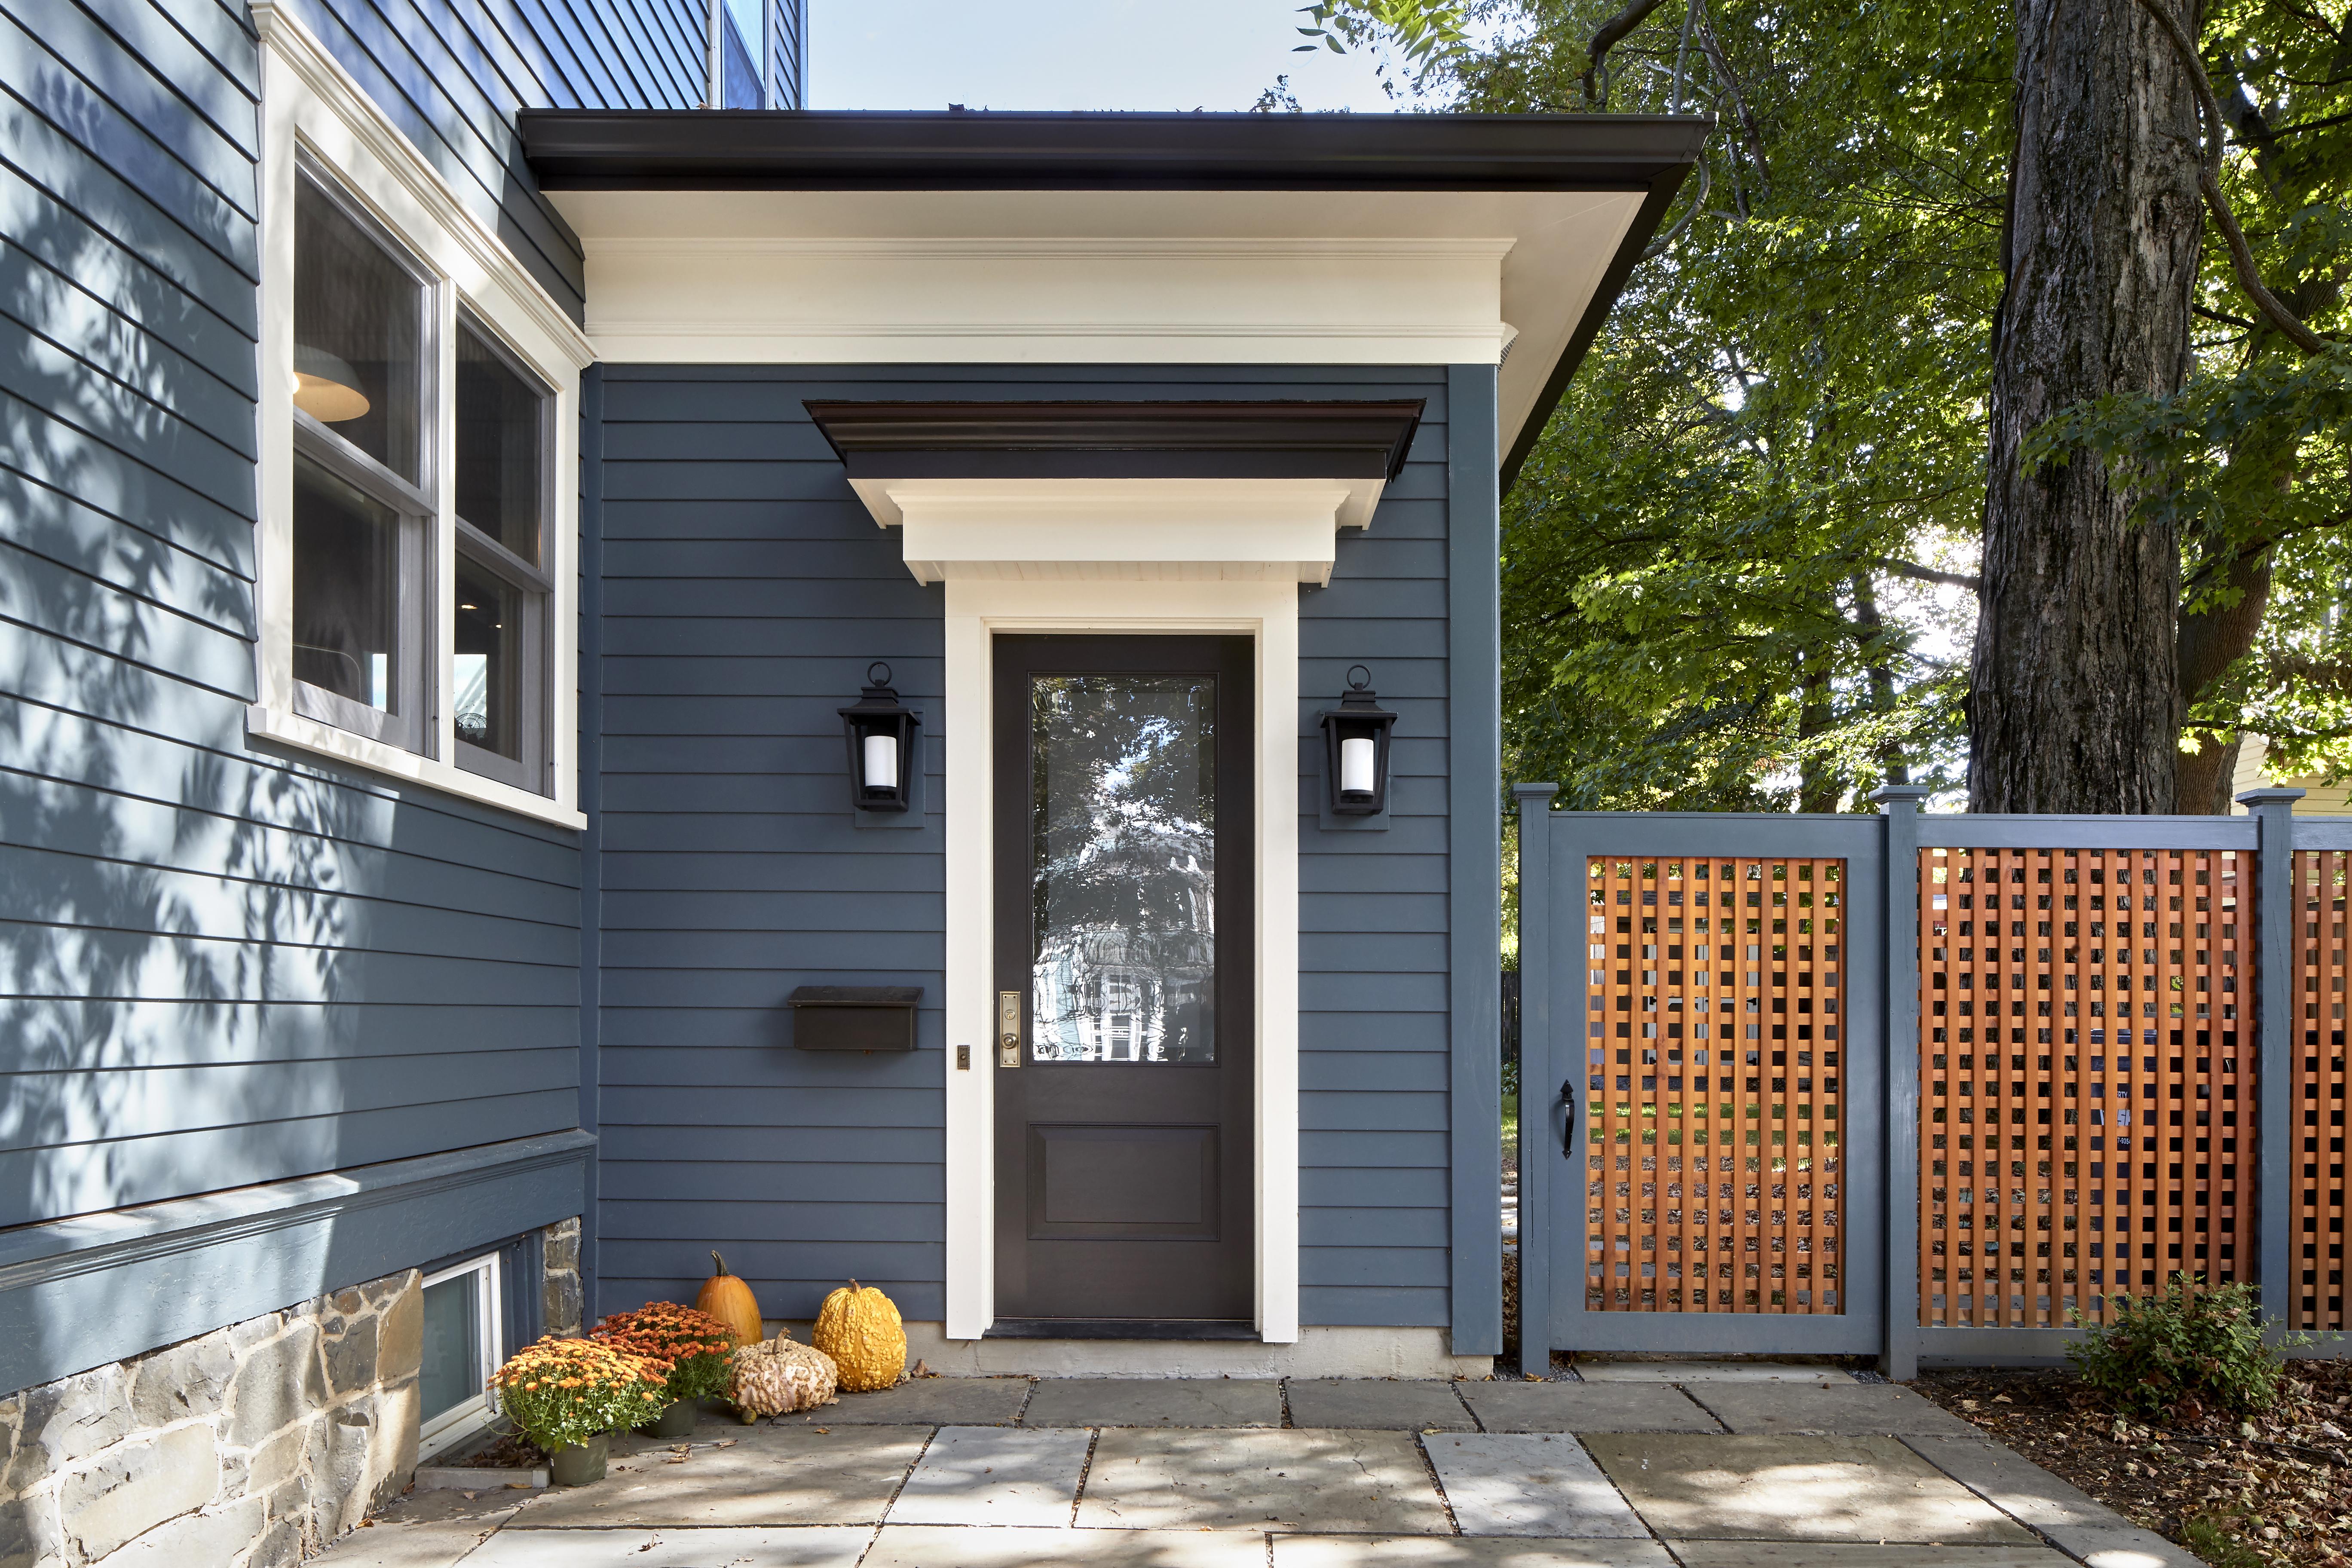 7 Mistakes Homeowners Make When Renovating Older Properties